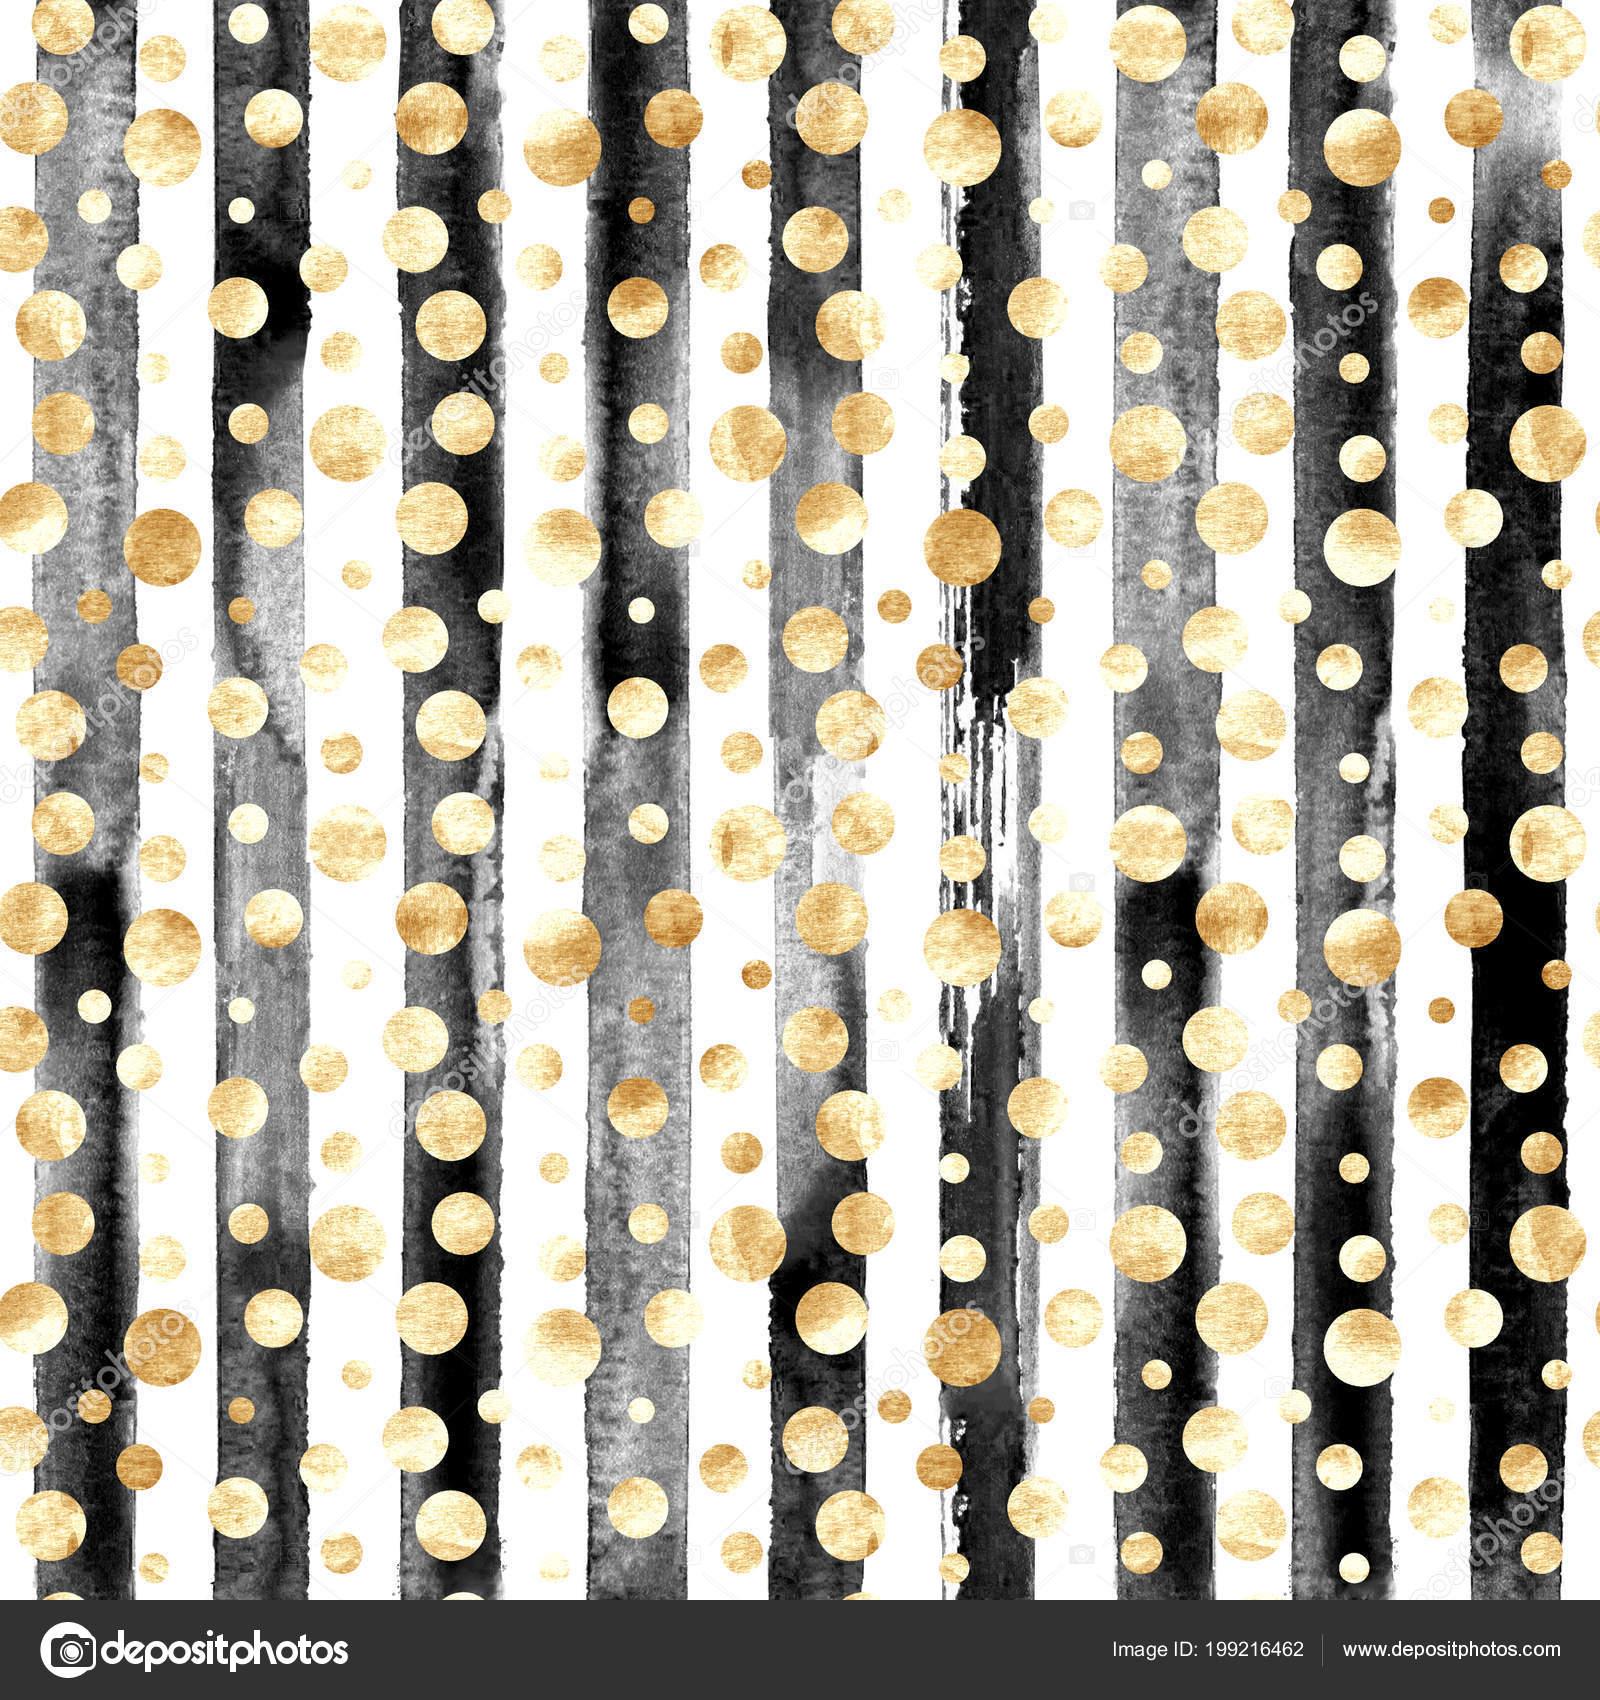 Black And White Stripes With Gold Polka Dots Abstract Gold Metal Confetti Black White Stripes Seamless Pattern Luxury Stock Photo C Olgaze 199216462